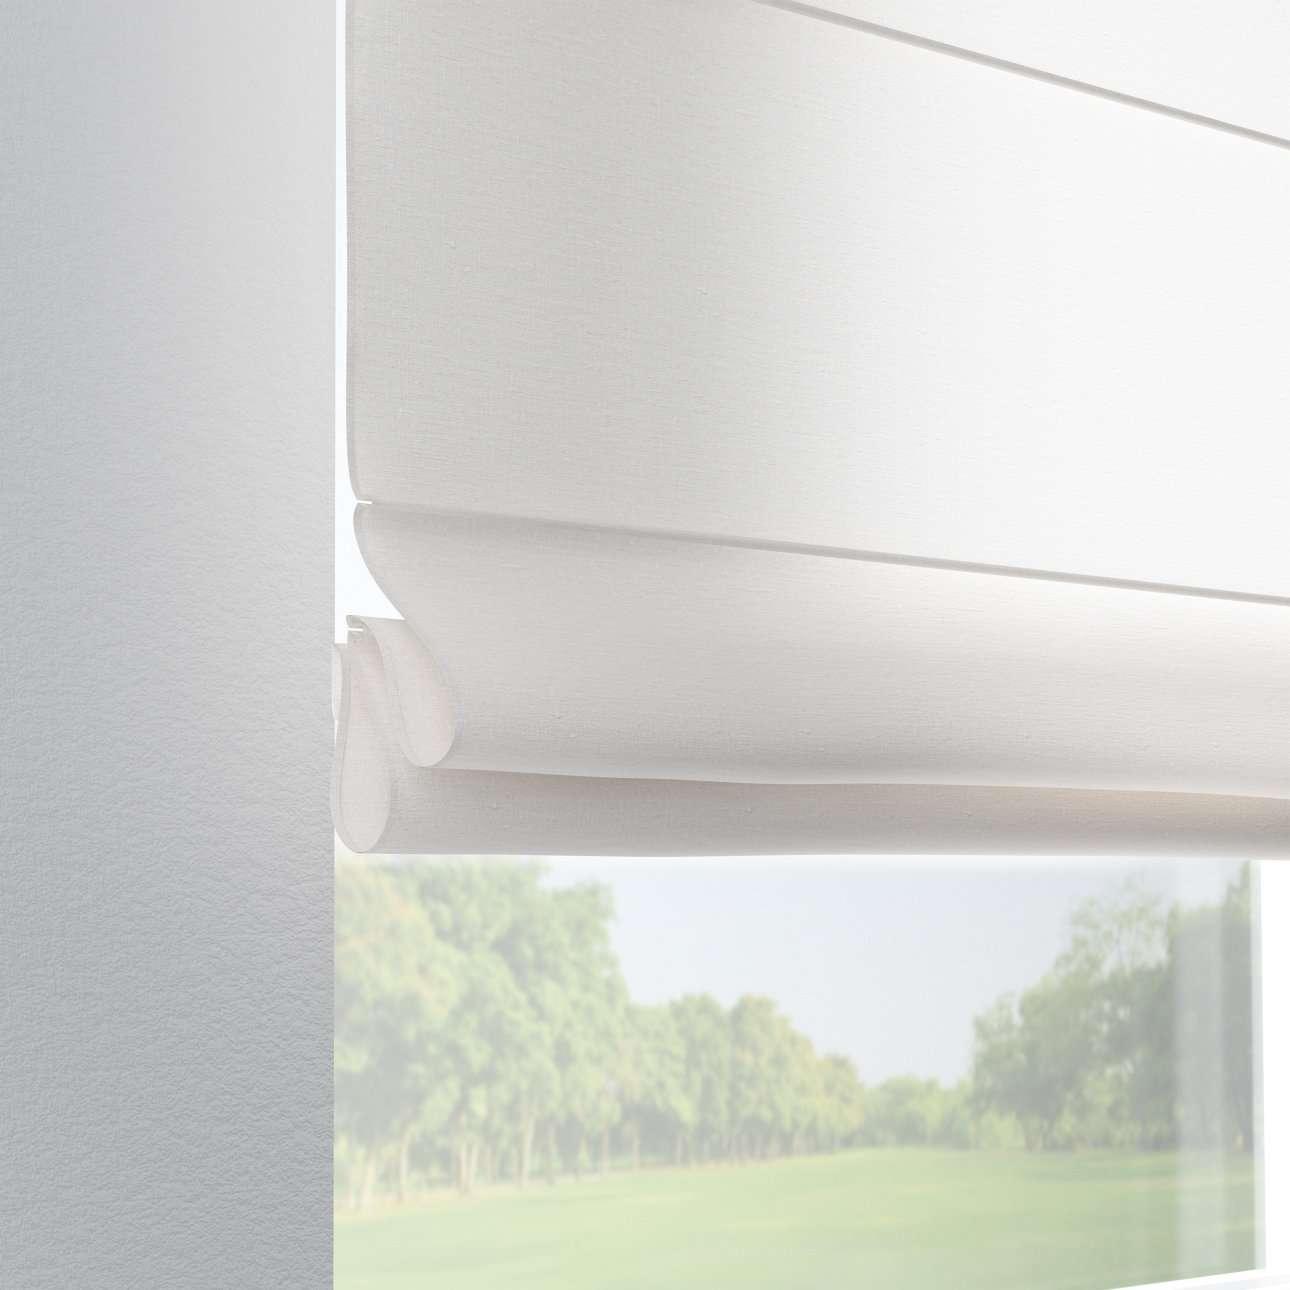 Foldegardin Verona<br/>Med stropper til gardinstang 80 x 170 cm fra kollektionen Linen, Stof: 392-04